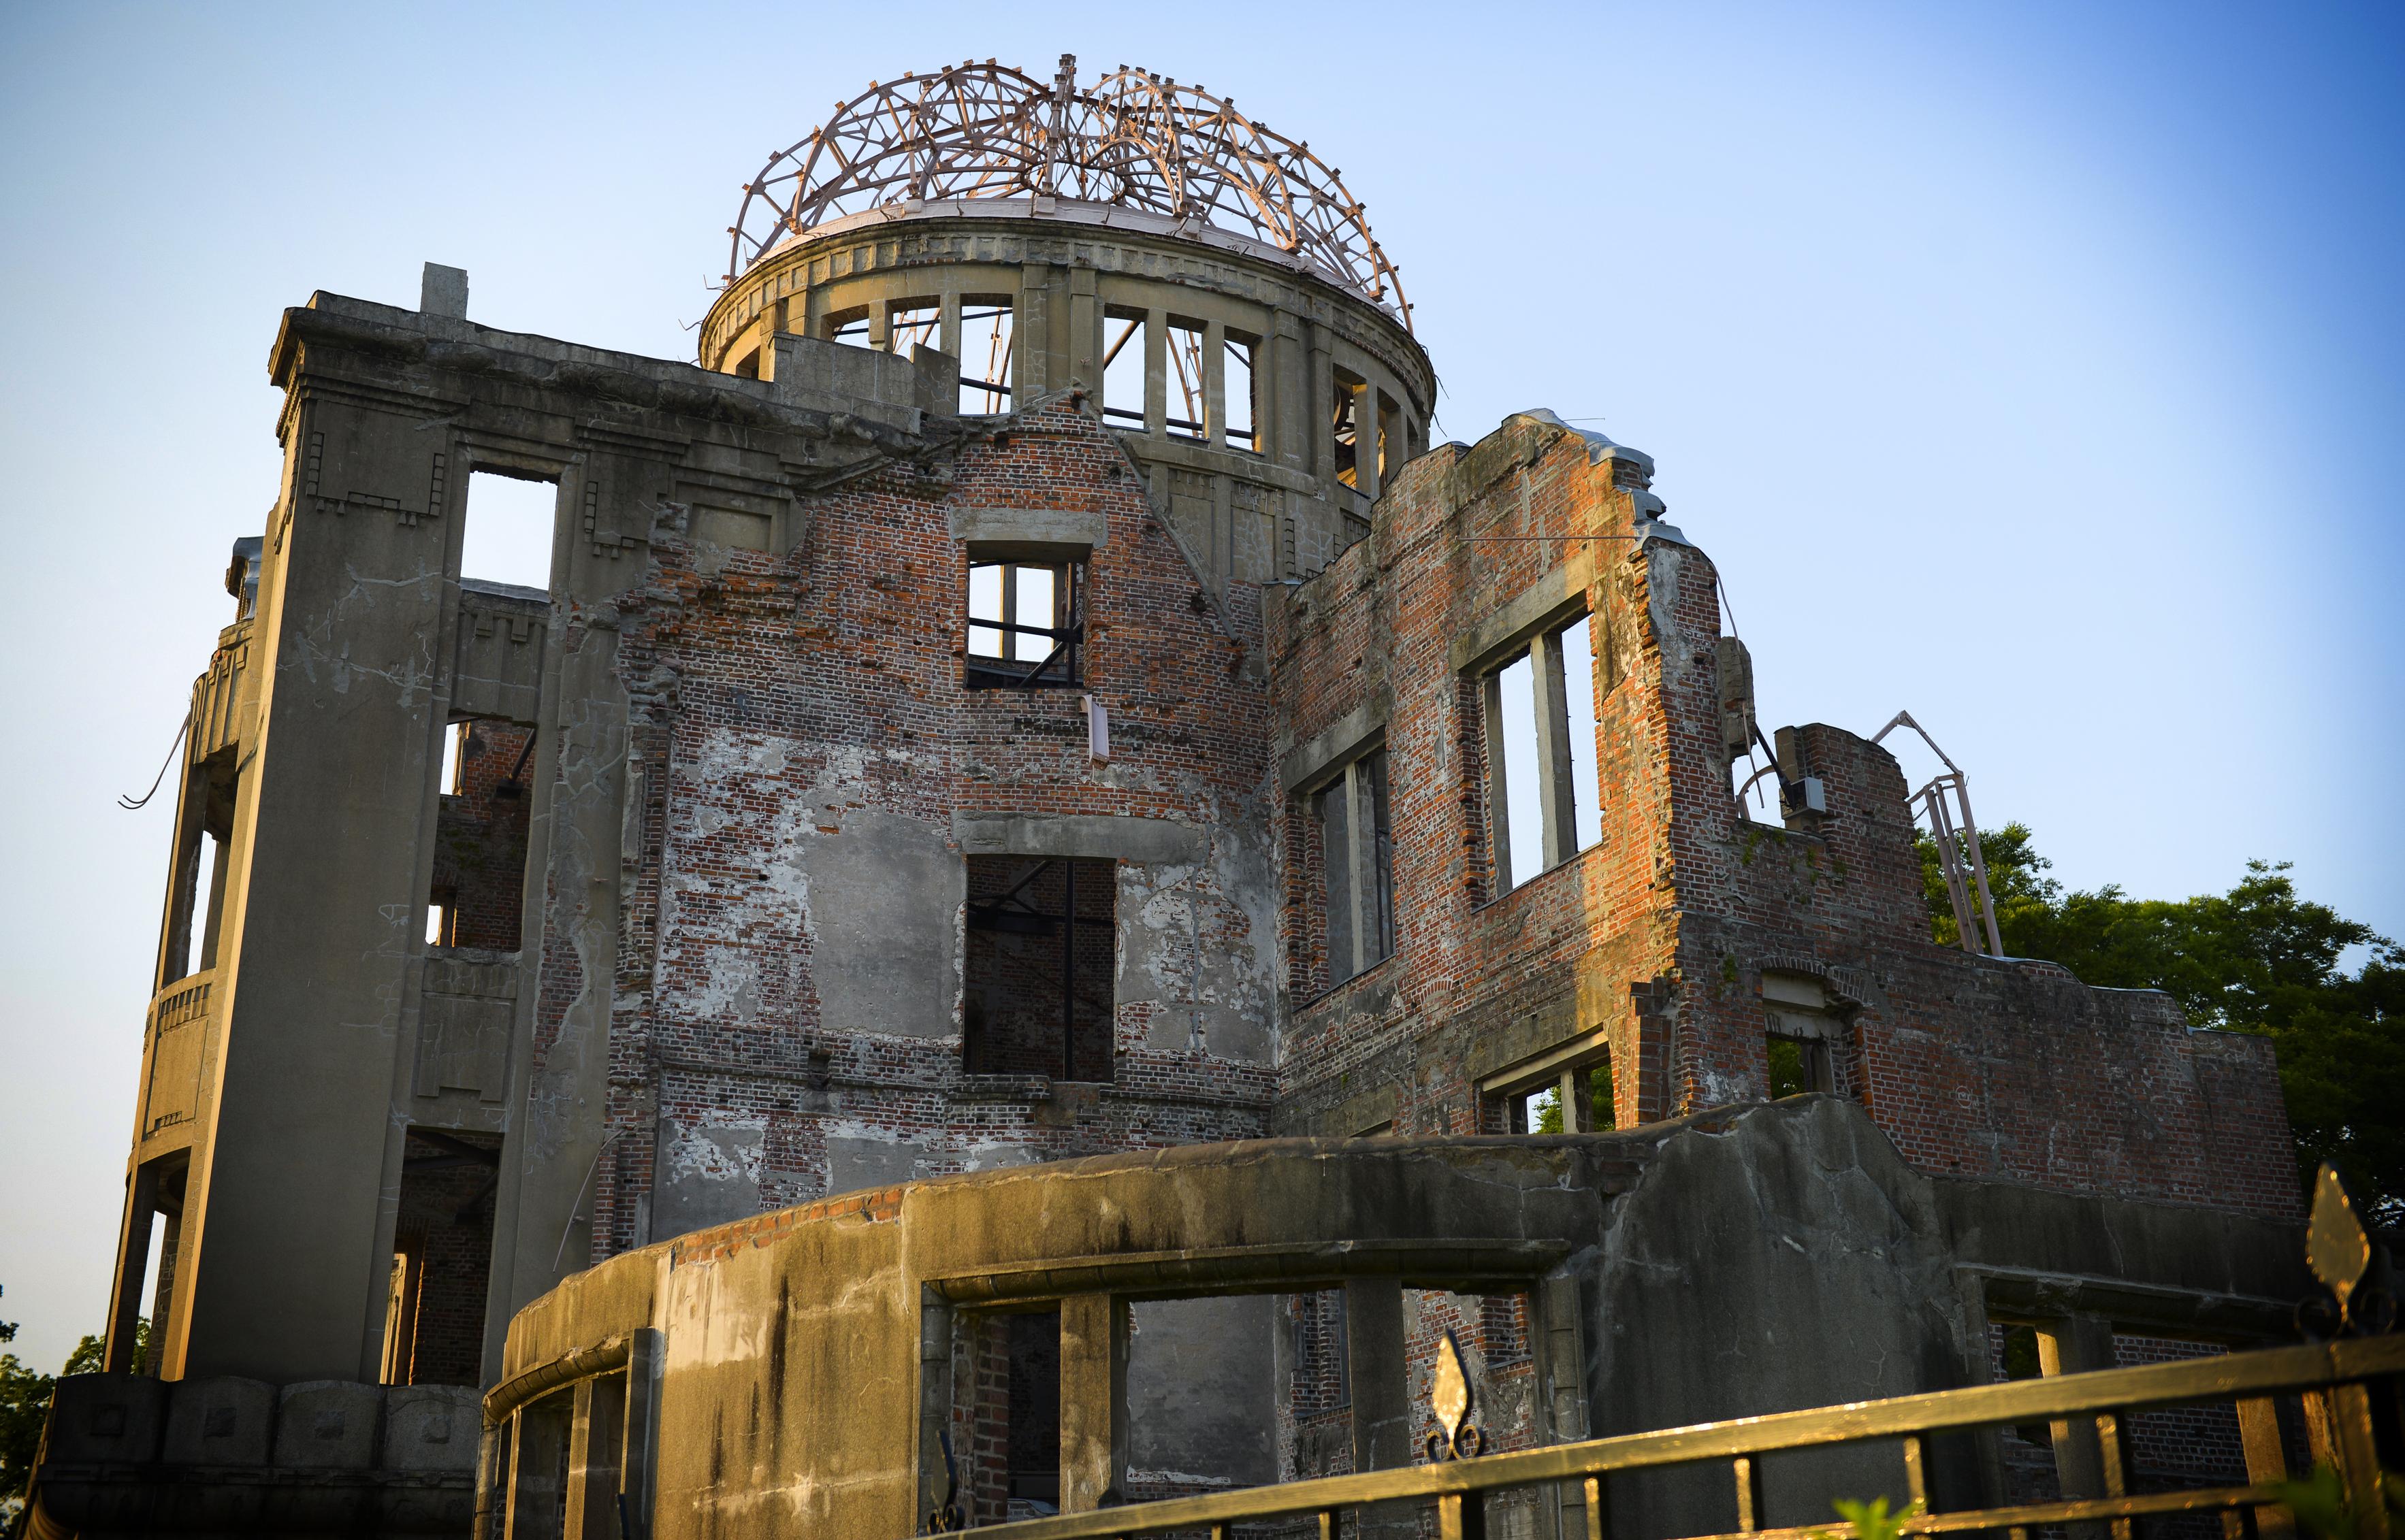 Obama bezoekt Hiroshima terwijl de Verenigde Staten hun kernwapenarsenaal moderniseren